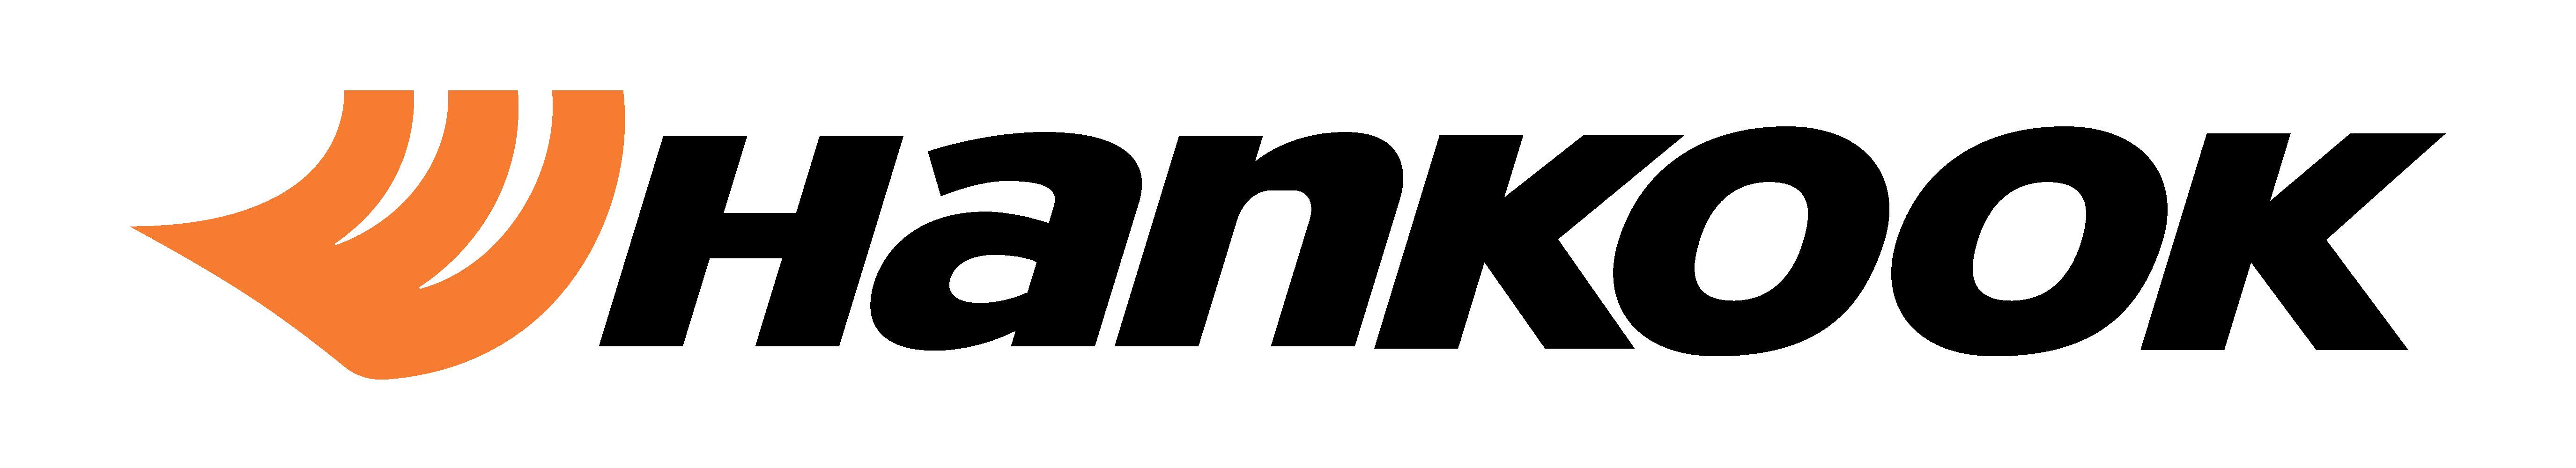 Hankook-logo-5500x1000